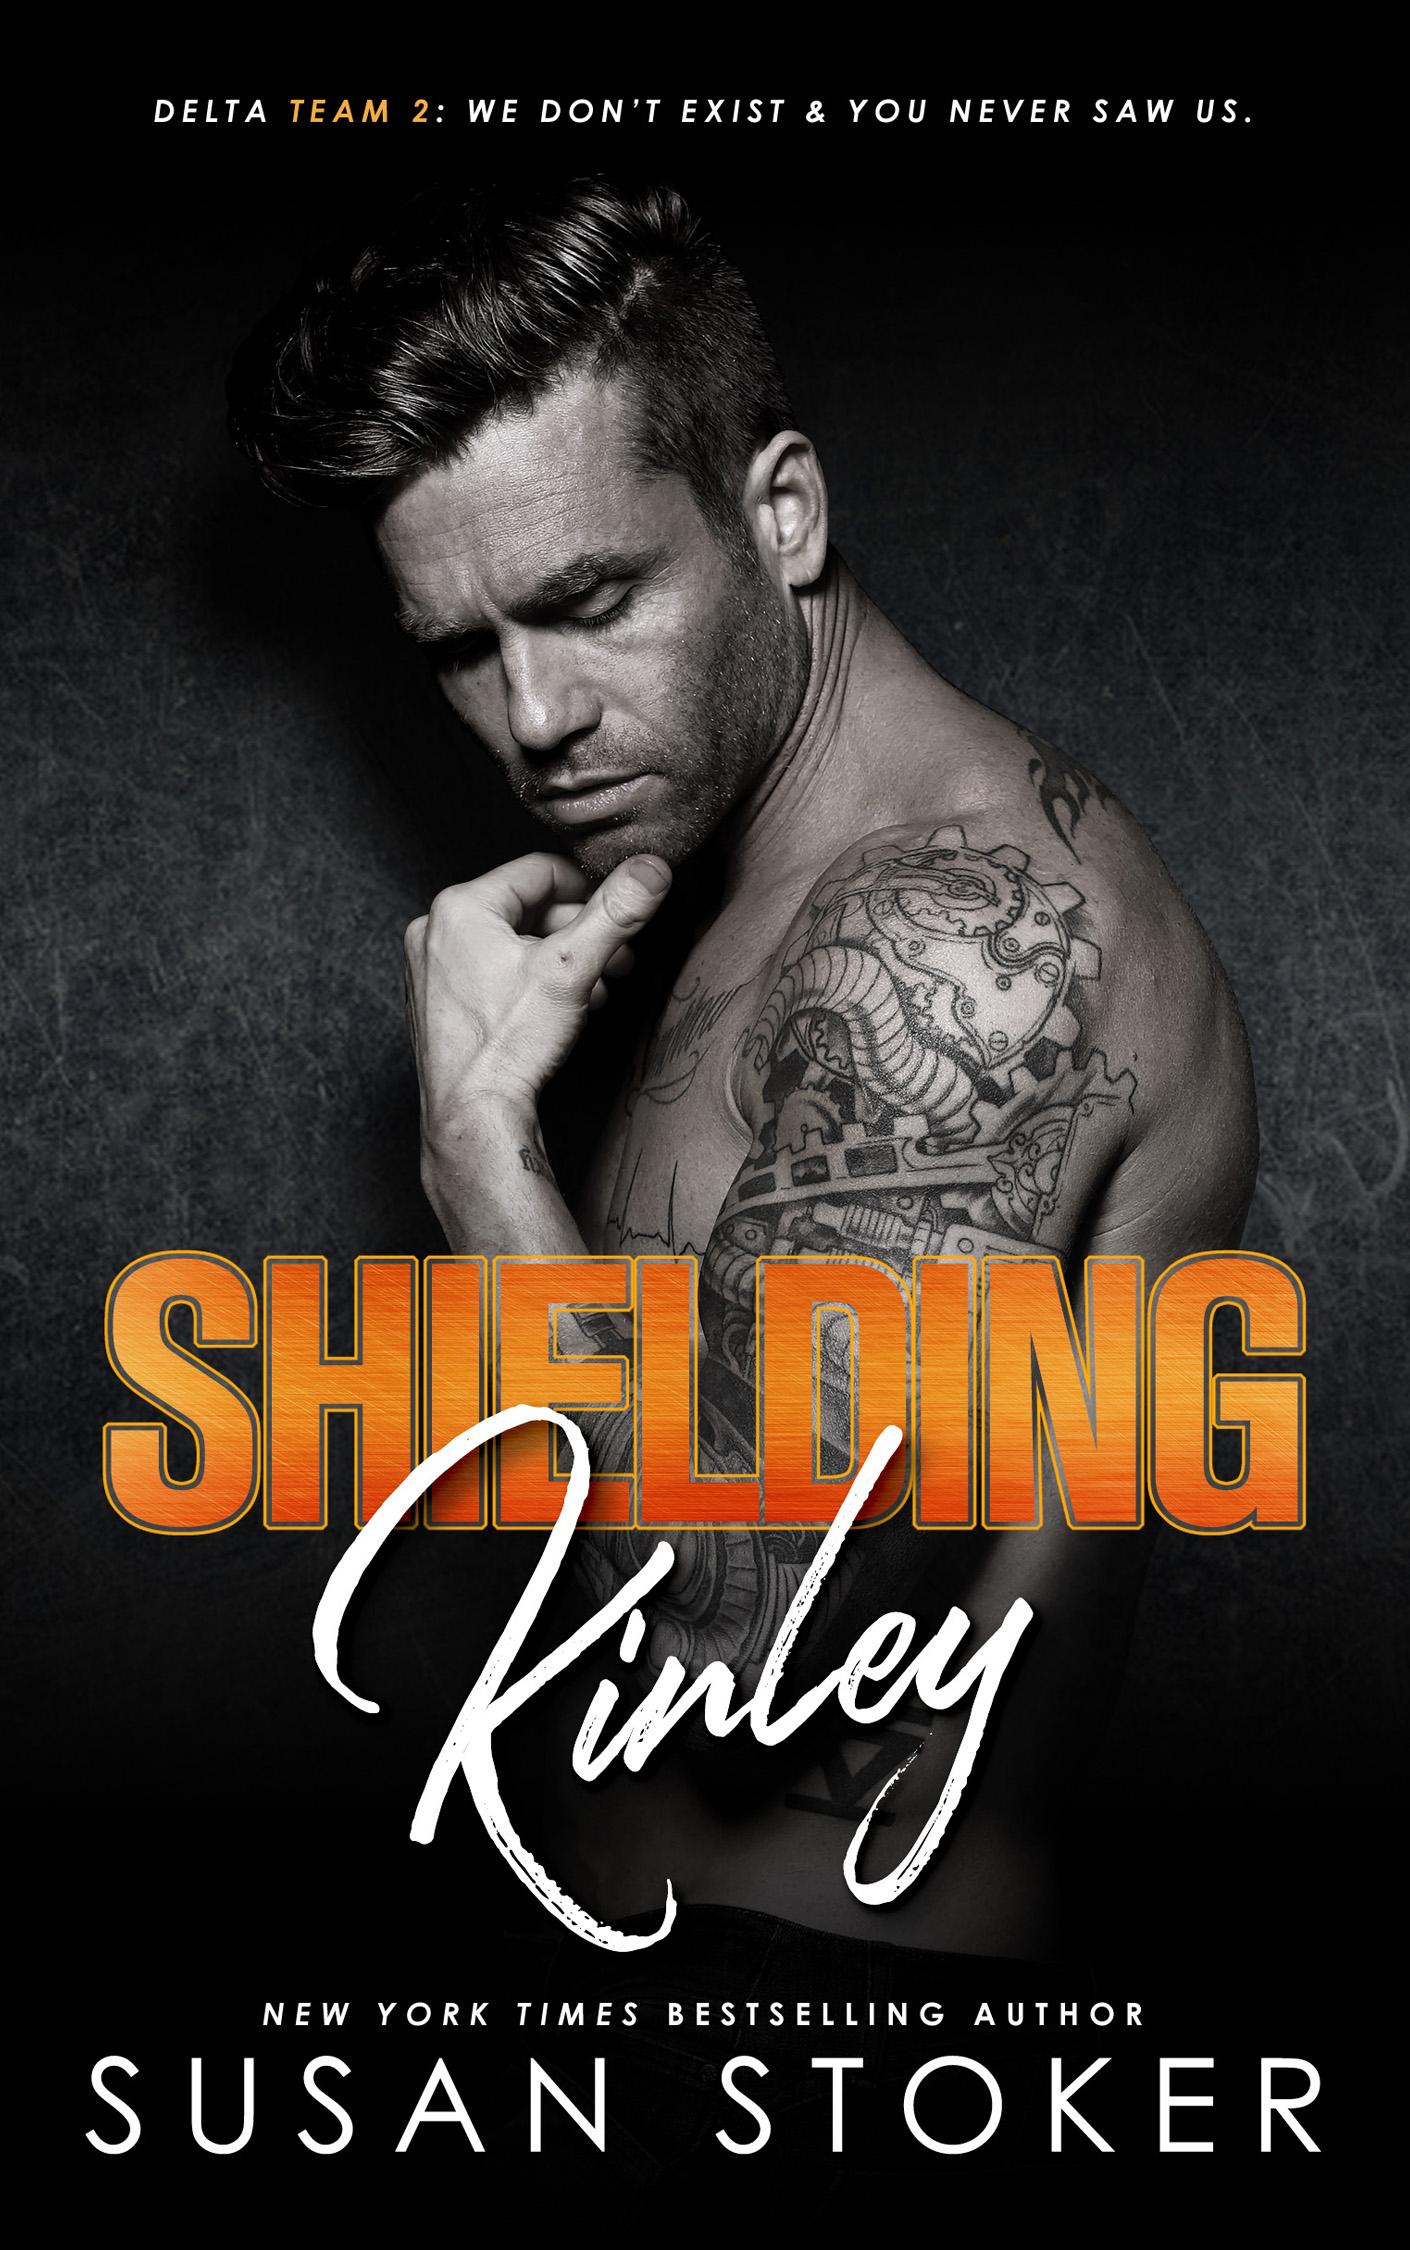 SHIEDLING KINLEY